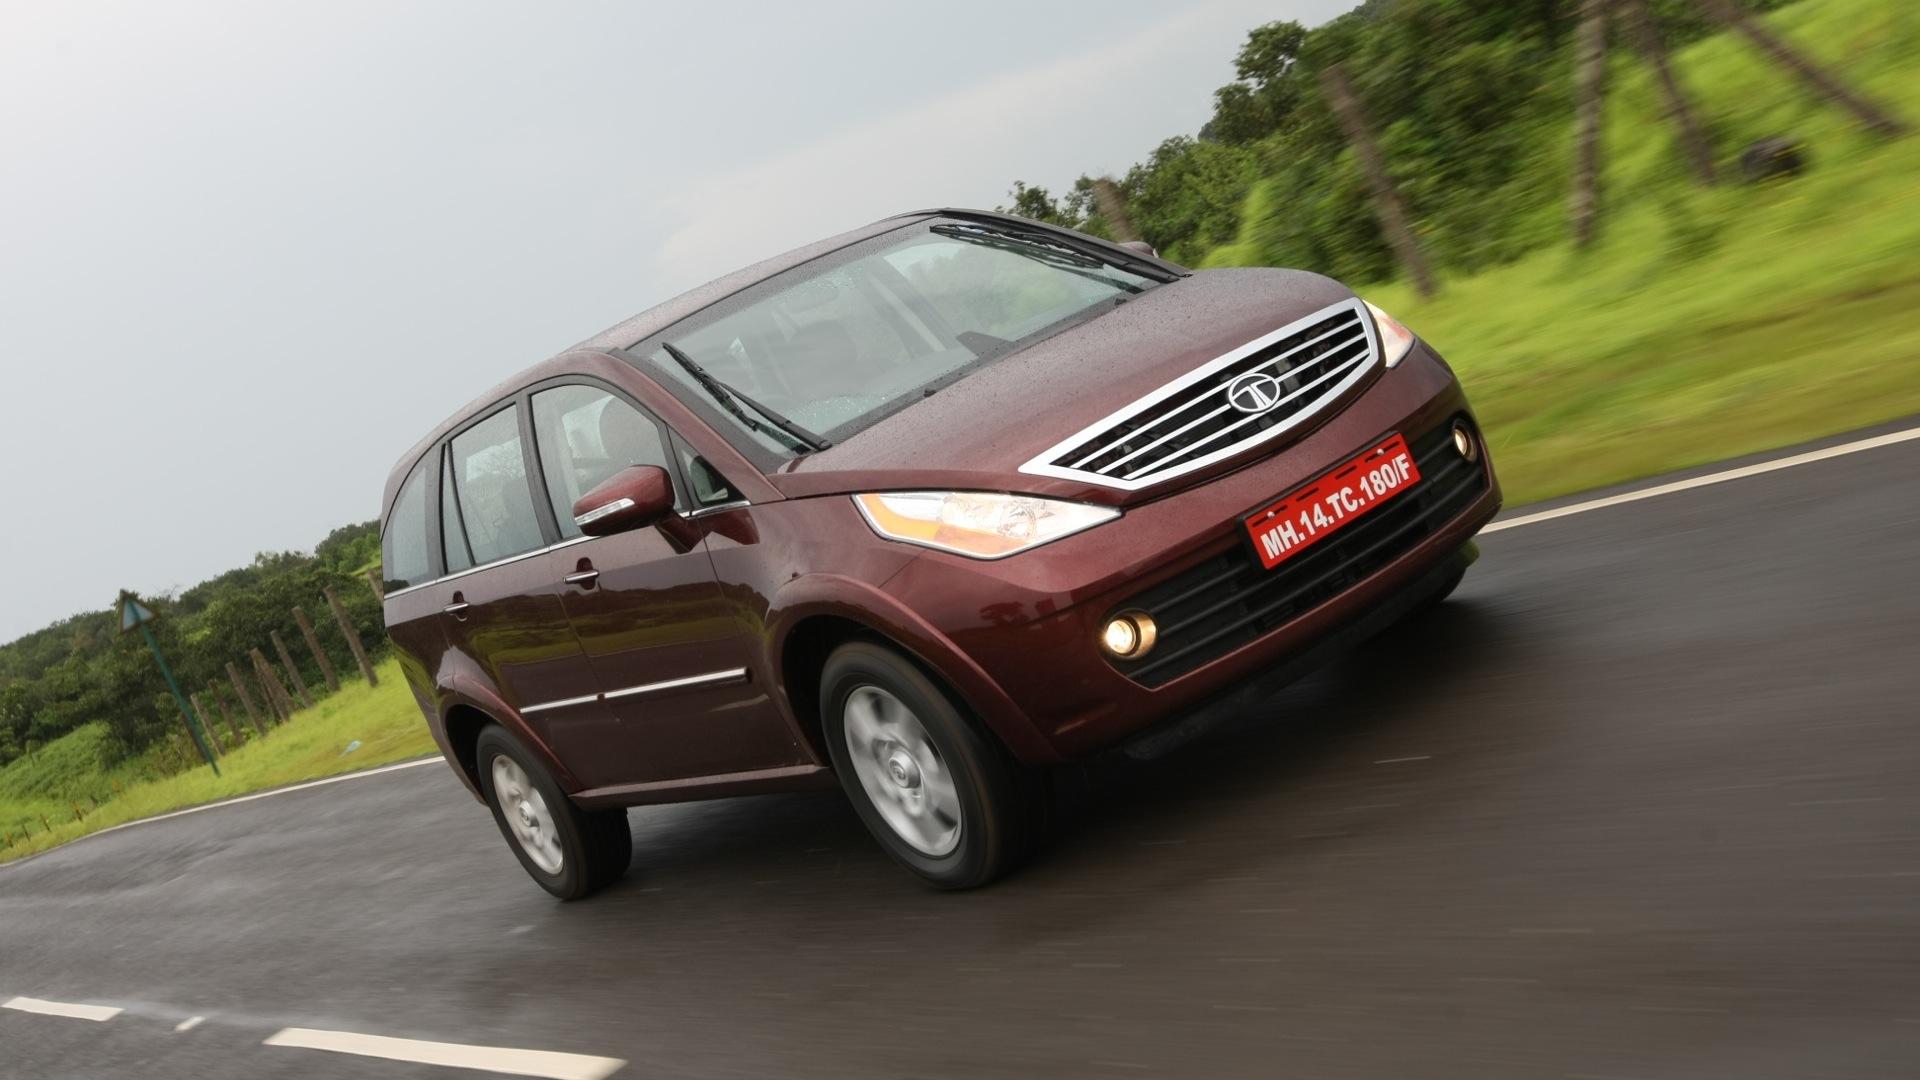 Tata Aria 2014 Pleasure - Price, Mileage, Reviews ...